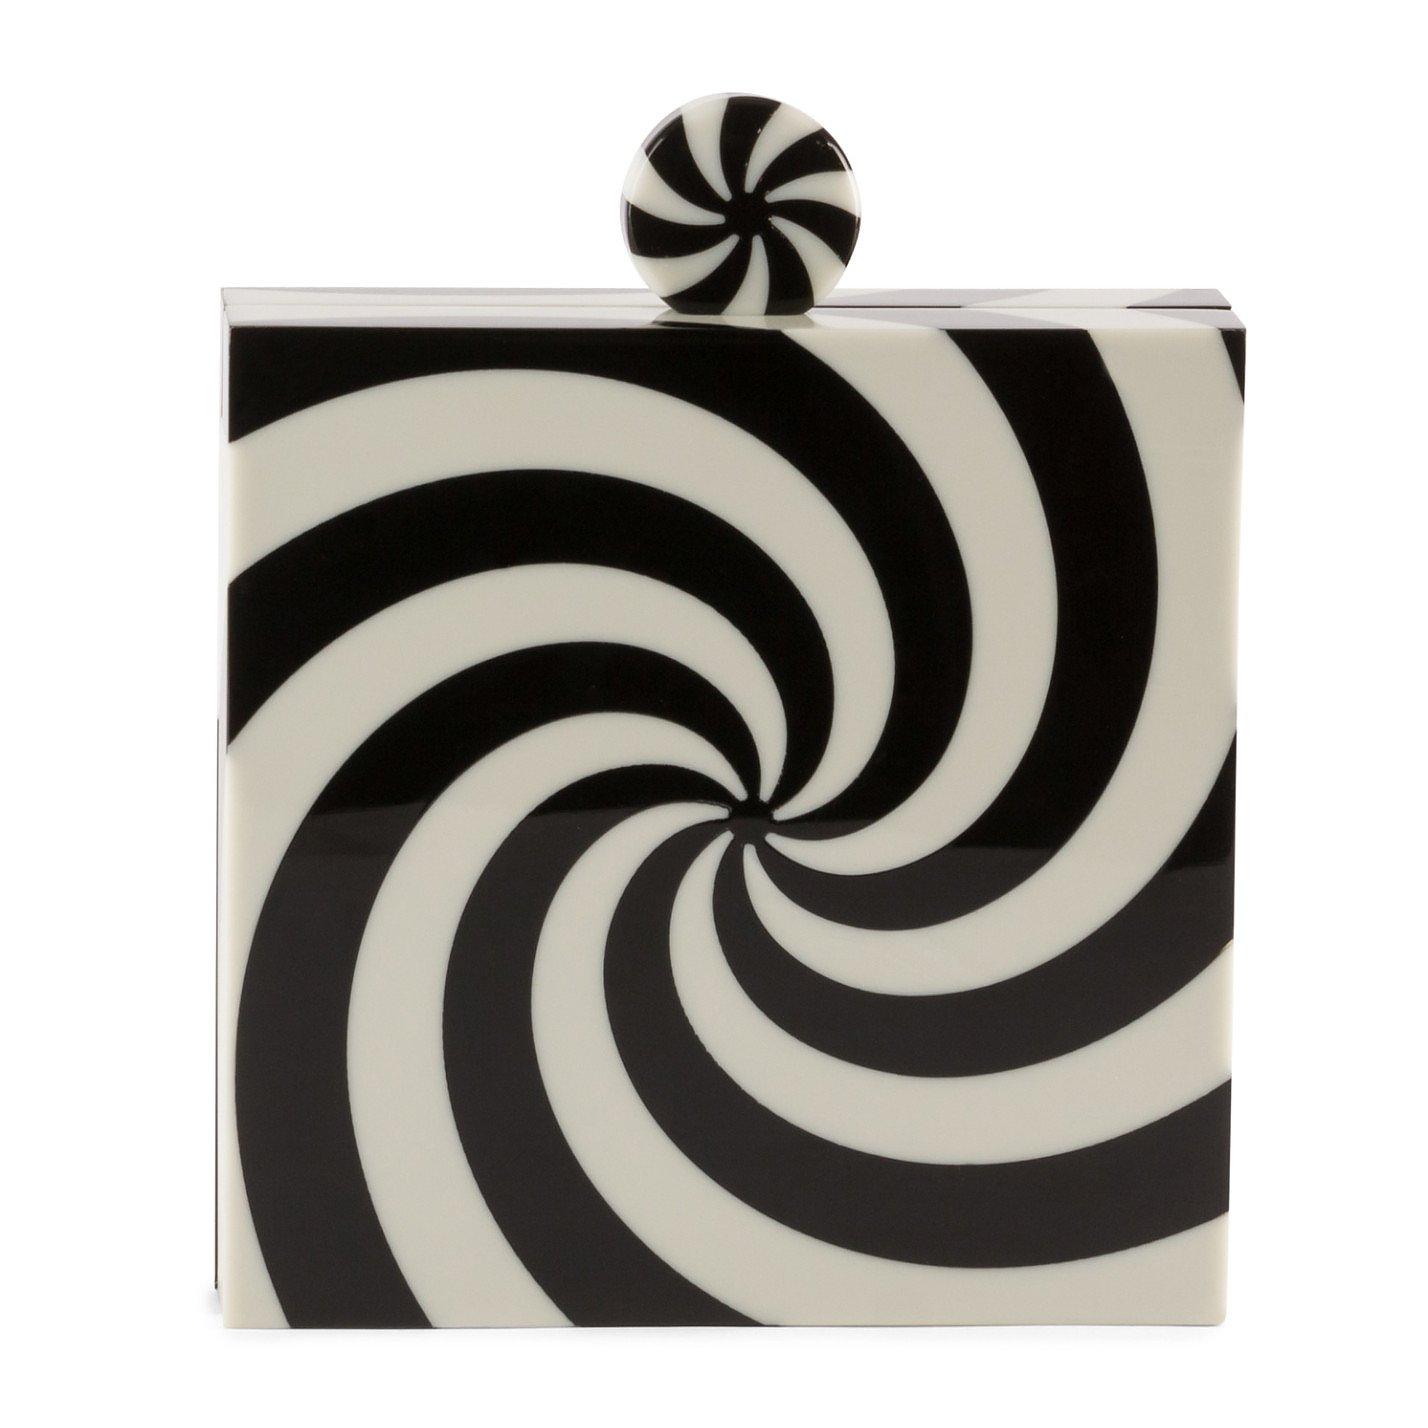 Charlotte Olympia Candy Swirl Box Clutch